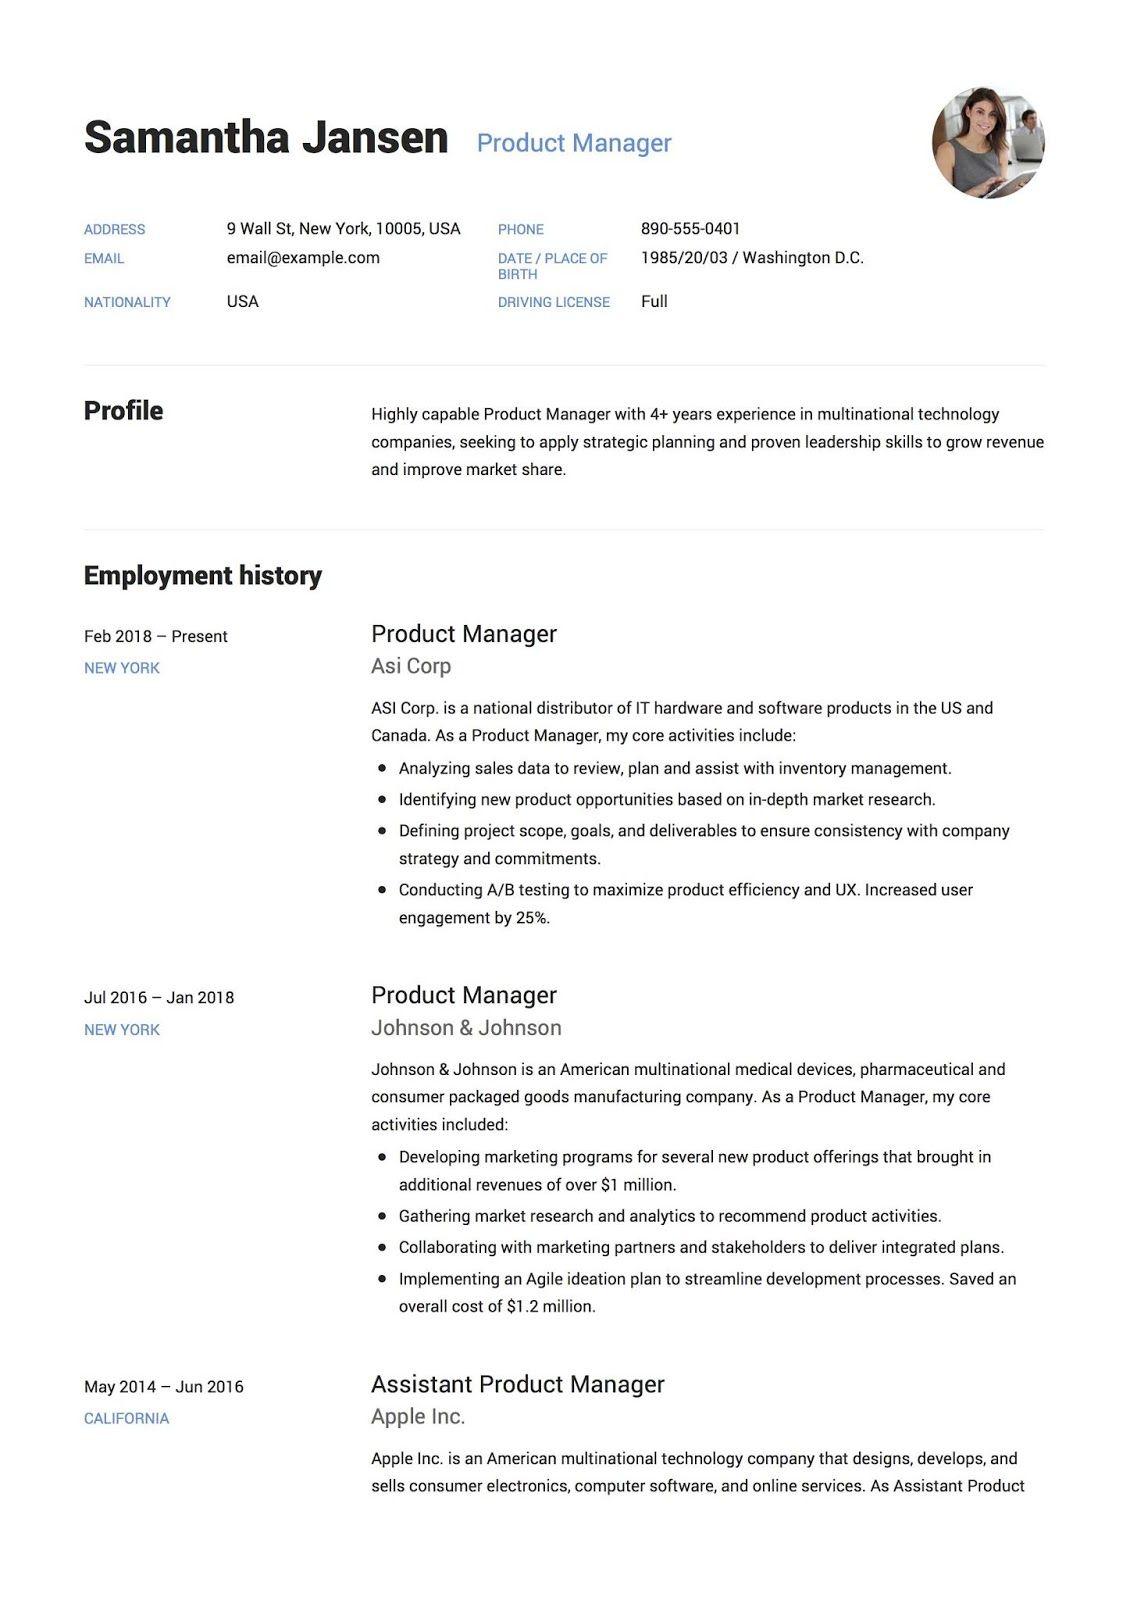 Resume Sample Pdf India